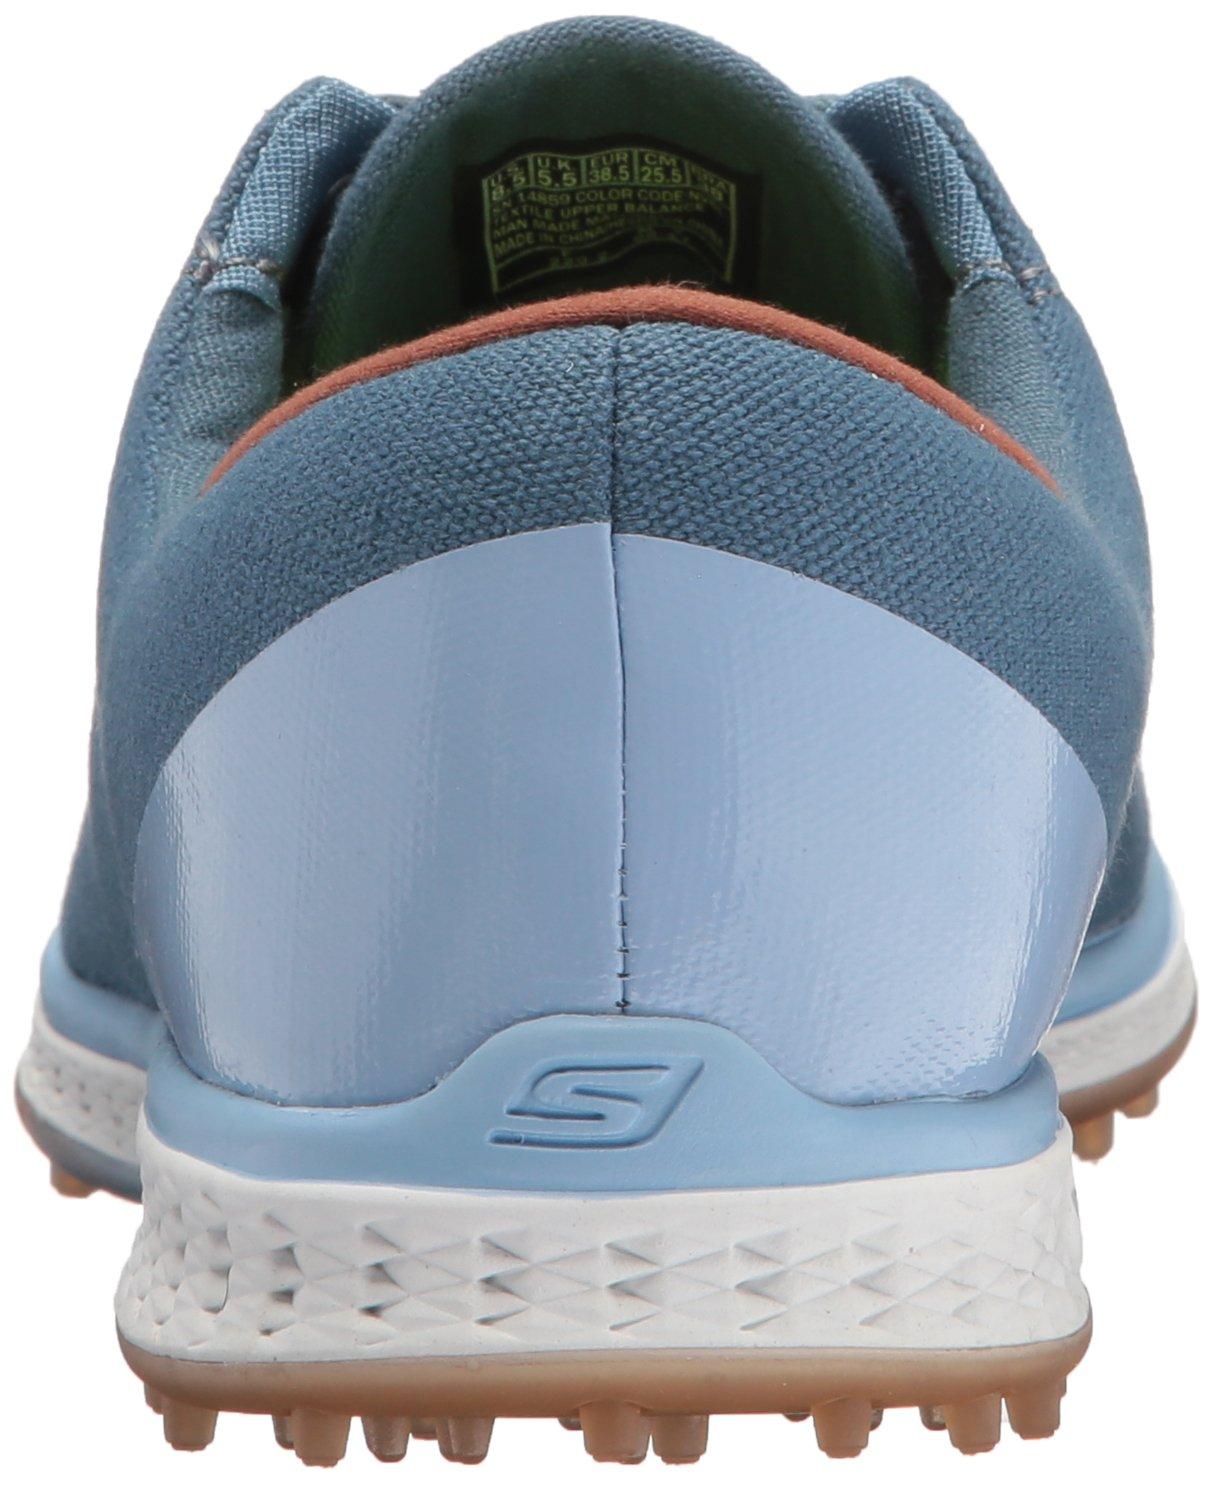 Skechers Performance Women's Go Golf Elite Canvas Golf Shoe B06XWDBY7M 6.5 B(M) US Navy/Blue